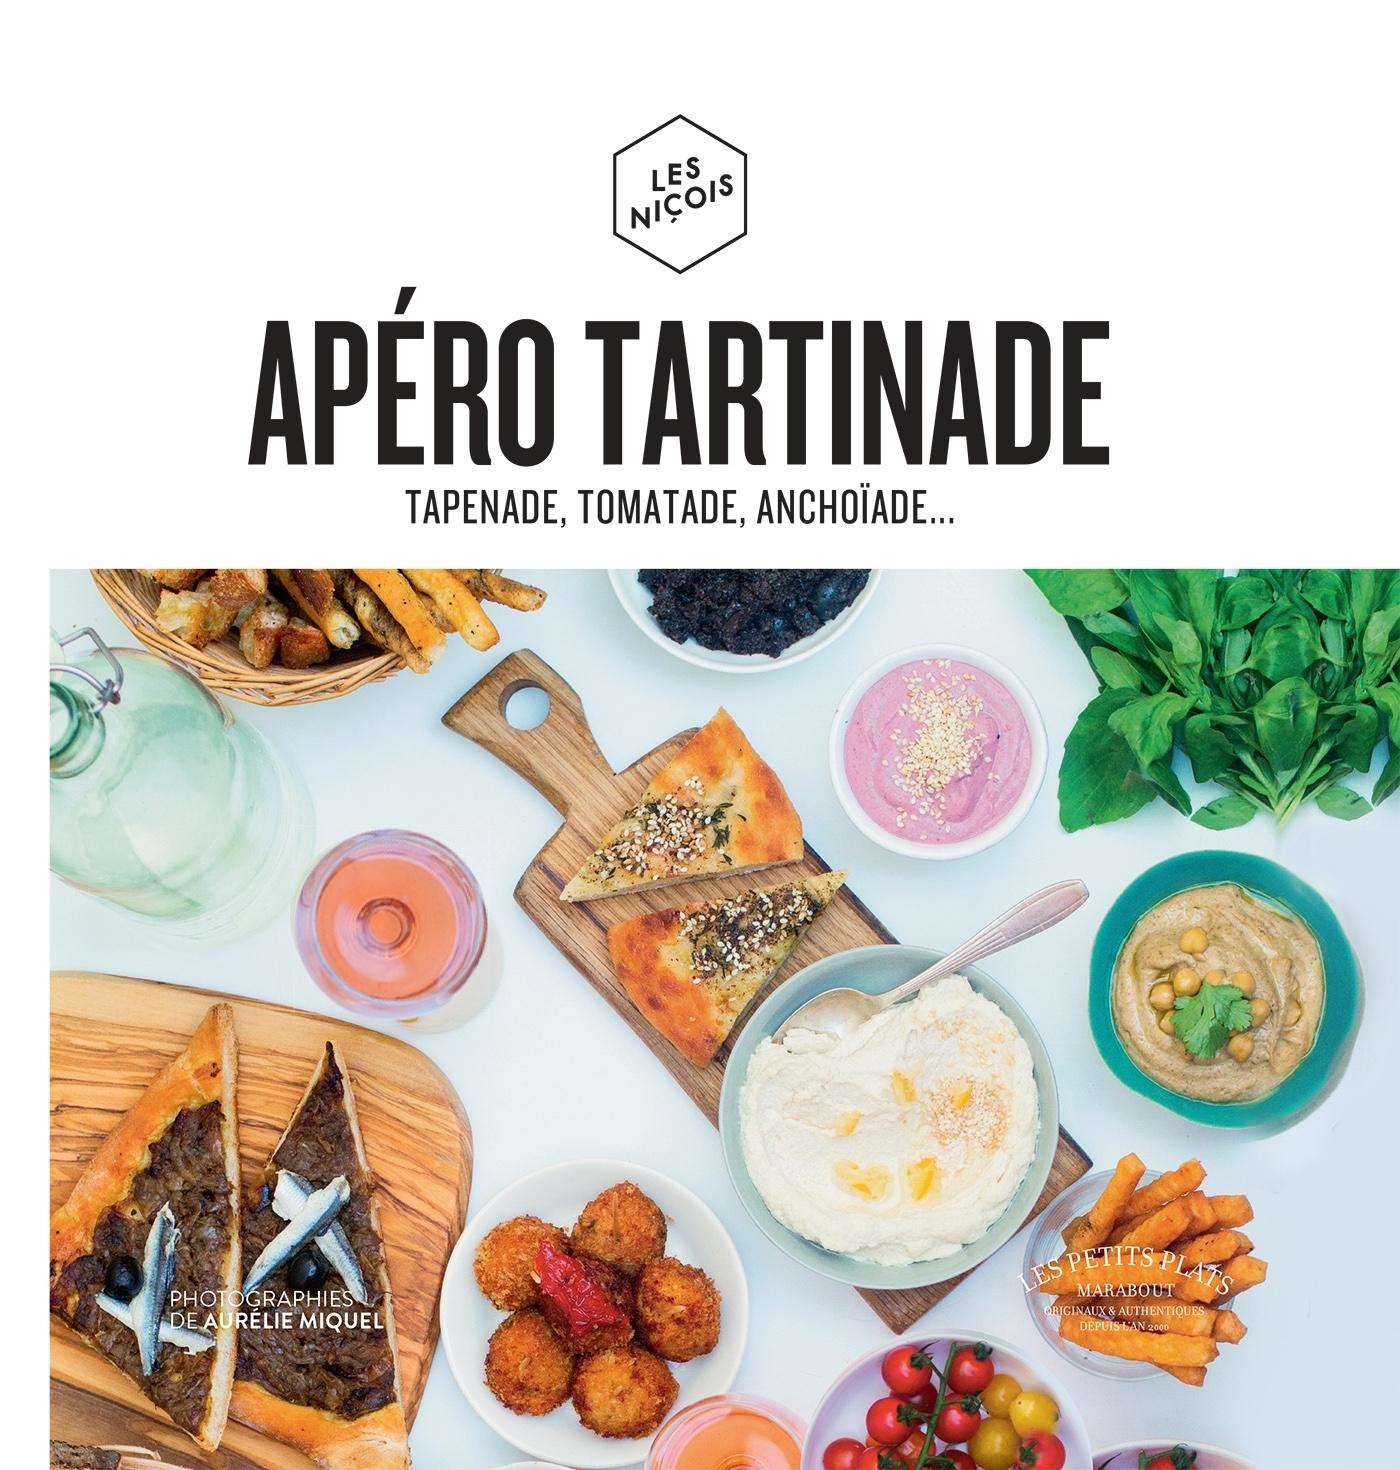 APERO TARTINADE